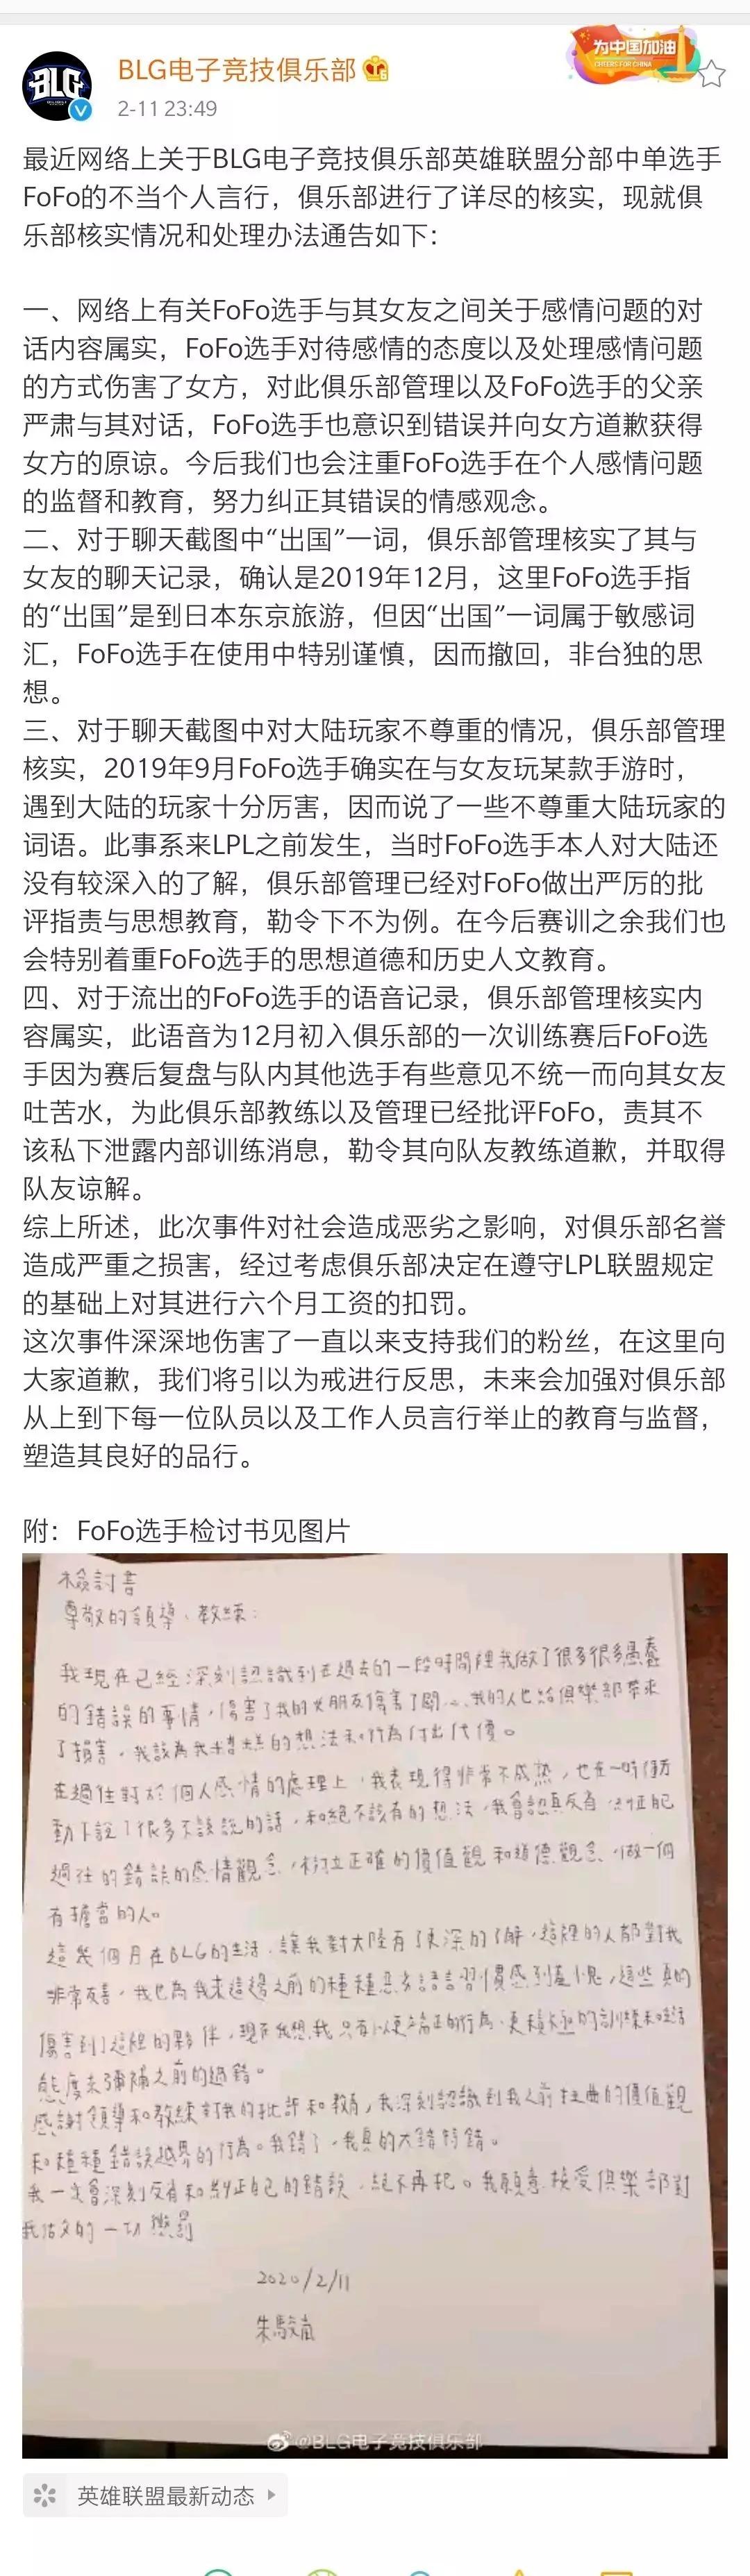 FOFO被战队处罚六个月工资,某手女主播整活惊呆网友! asmr资讯